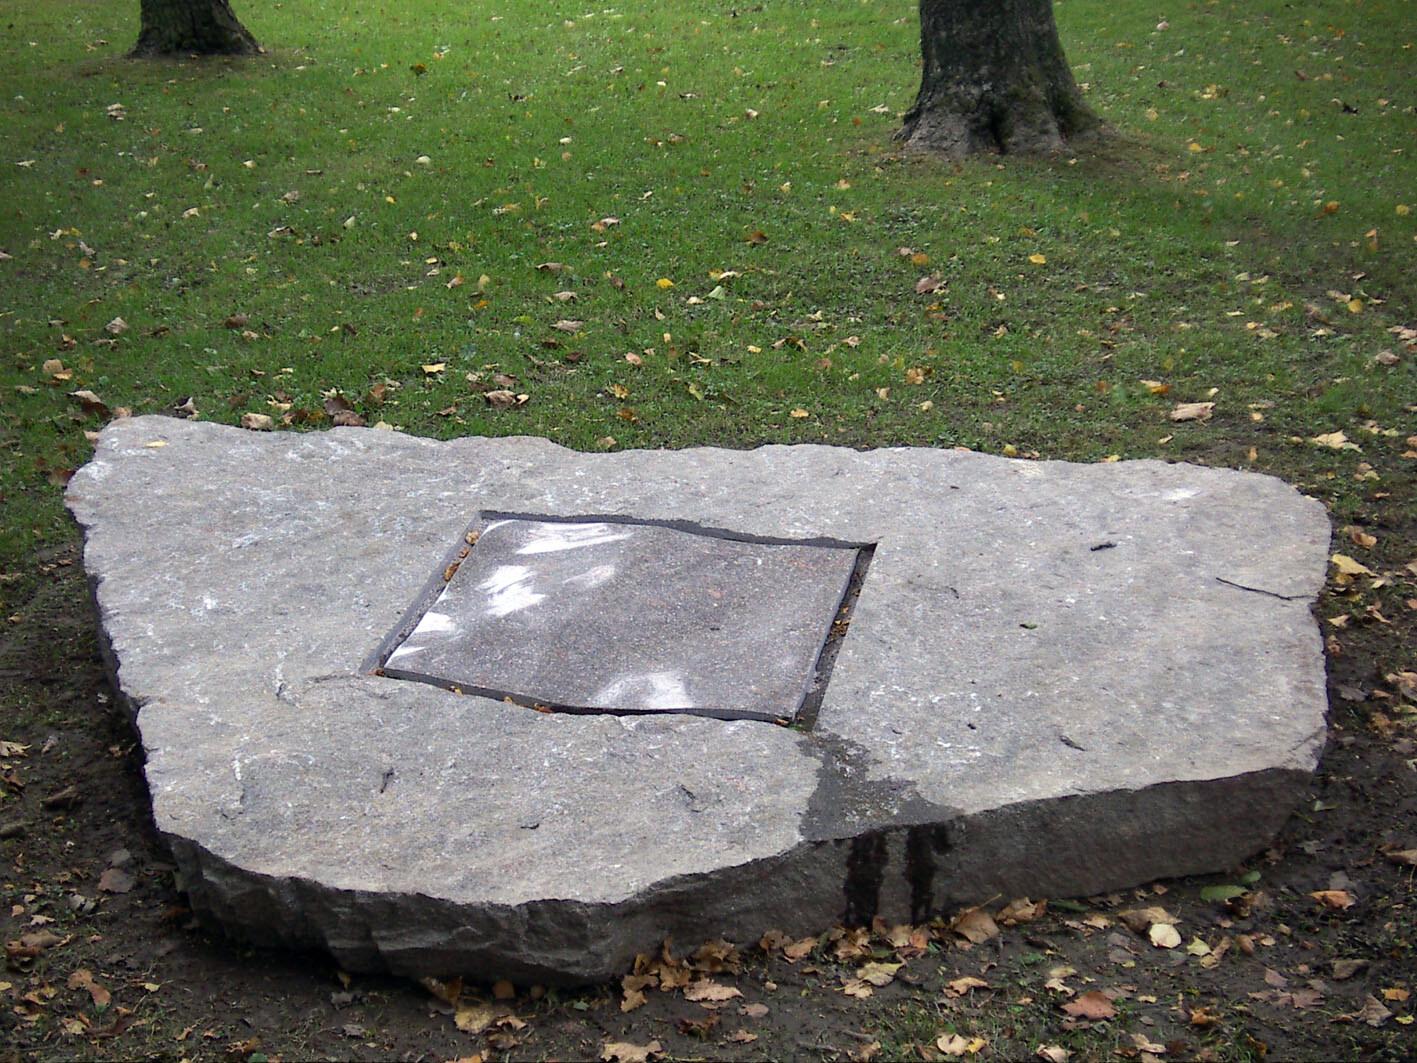 Arredo urbano ed elementi d 39 arredo stonegroup for Arredo urbano in inglese